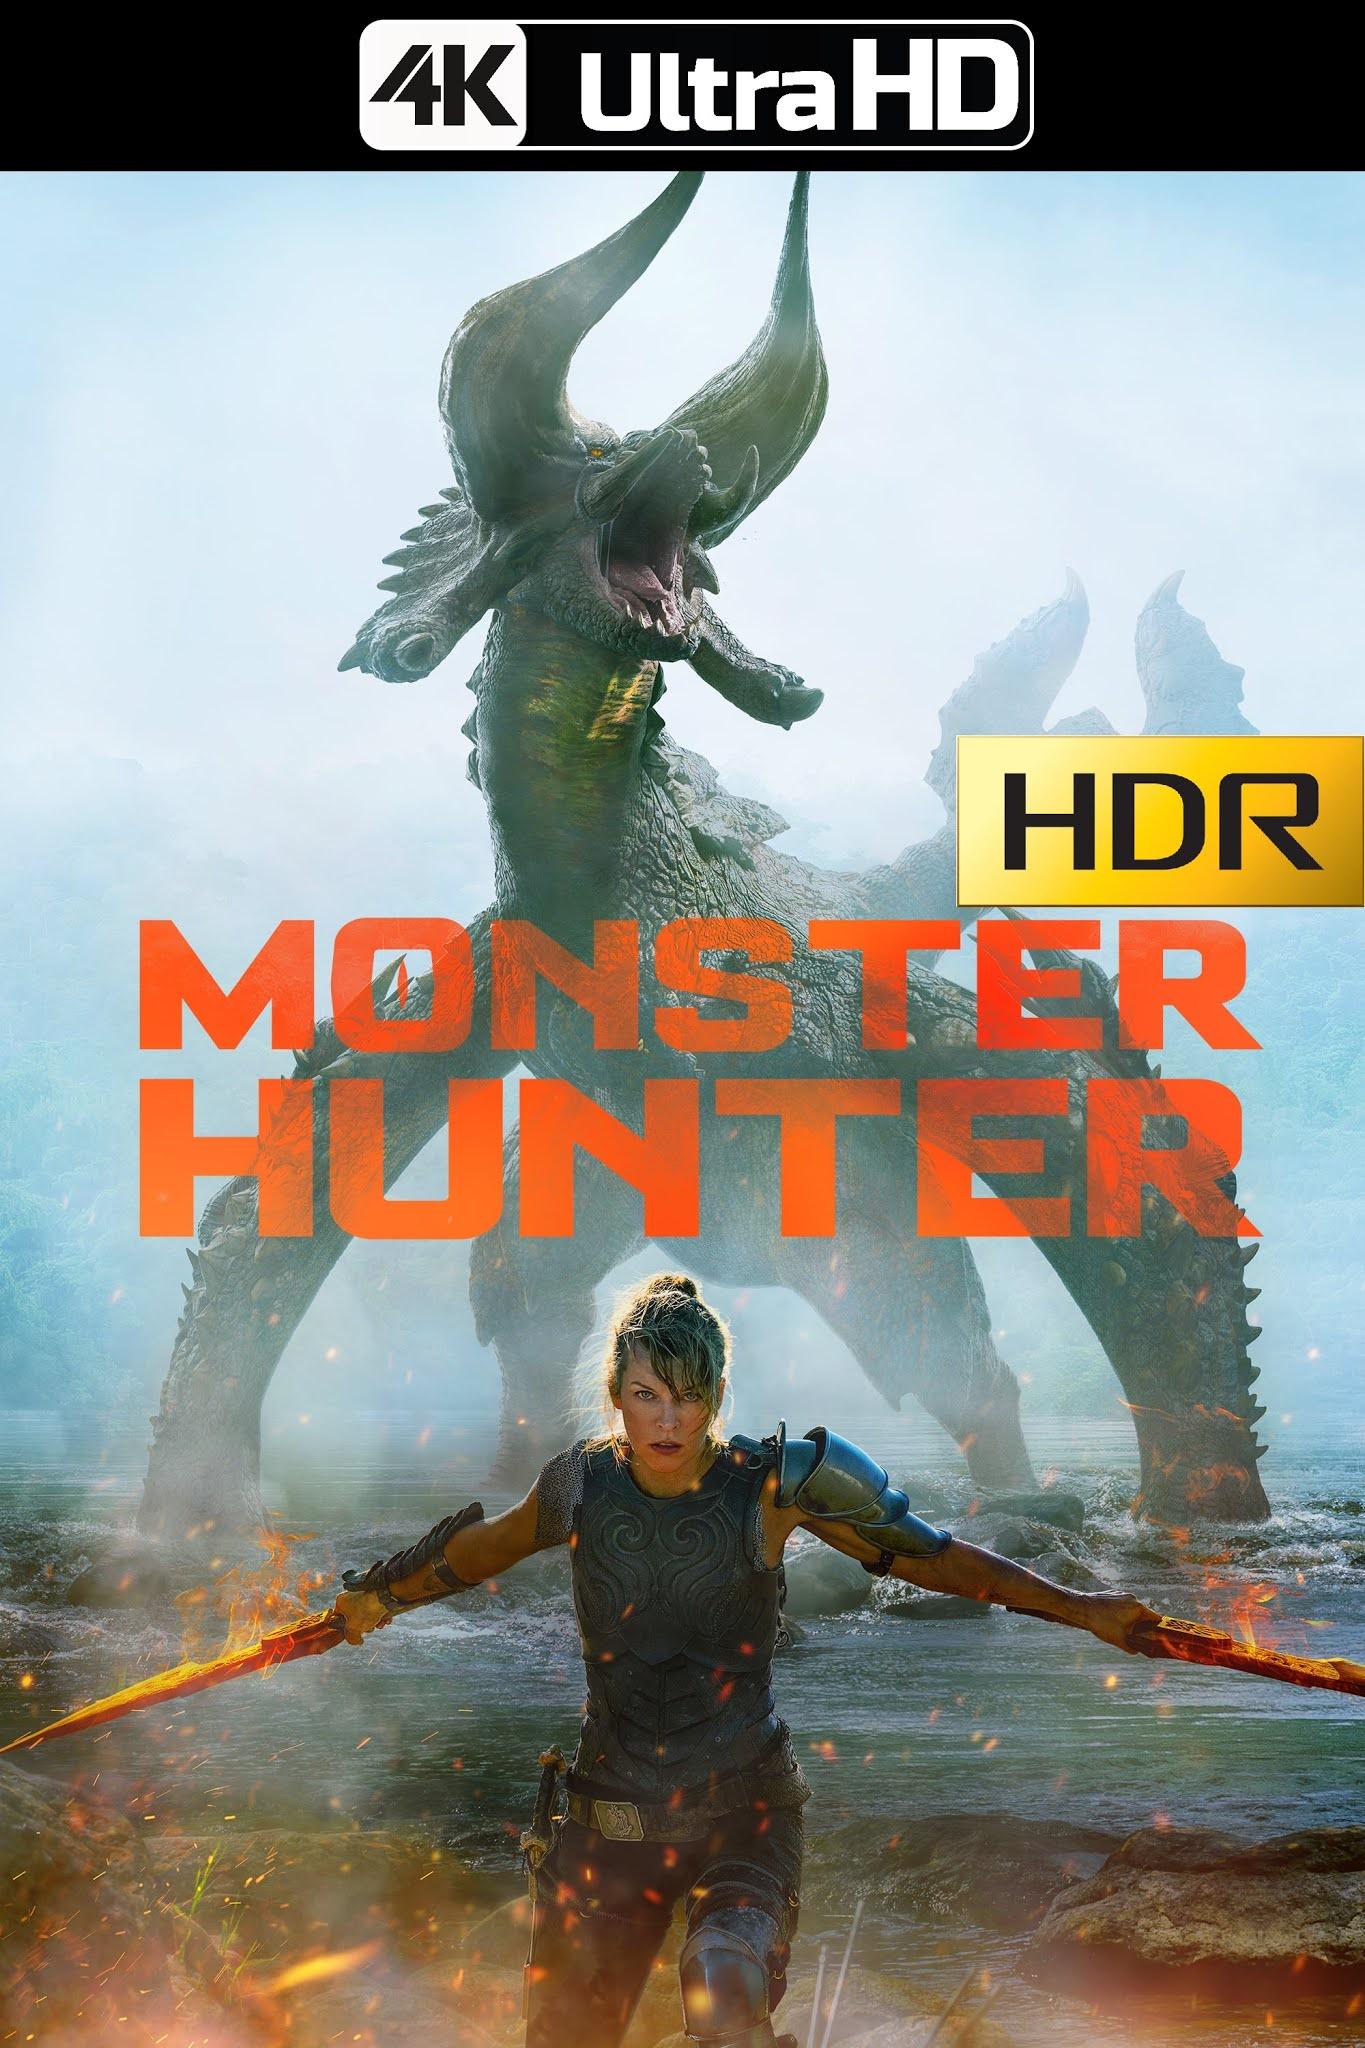 Monster Hunter (2020) 4K HDR WEB-DL Latino – CMHDD